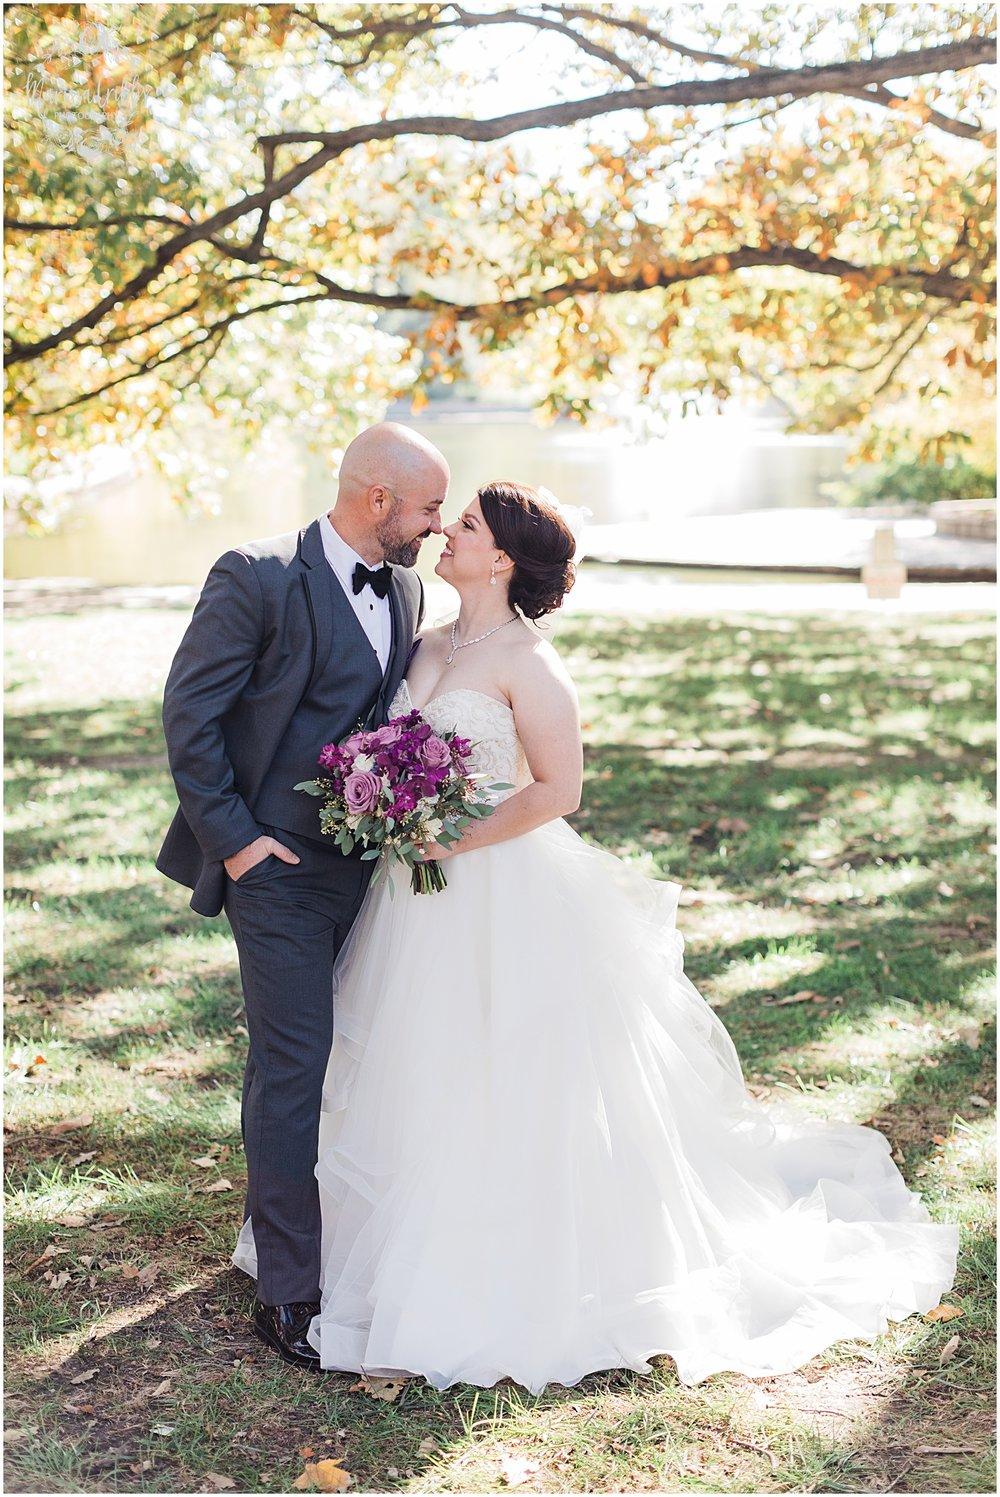 LAURA & DAN MARRIED   NELSON ATKINS MUSEUM   MARISSA CRIBBS PHOTOGRAPHY_7009.jpg